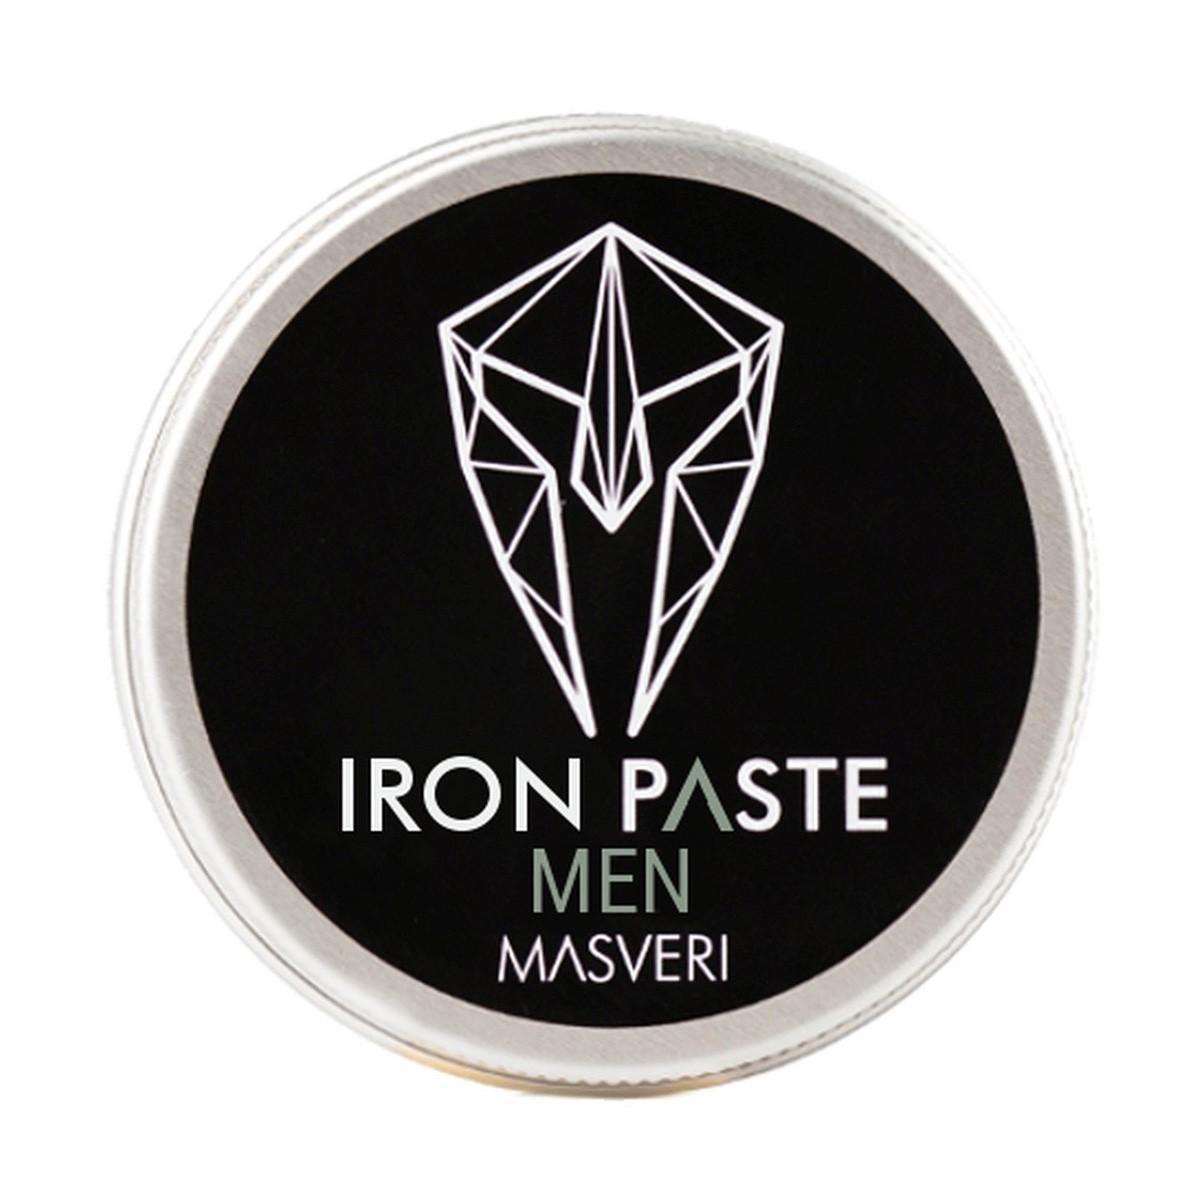 MASVERI Men Iron Paste 100ml - Matująca pasta do włosów